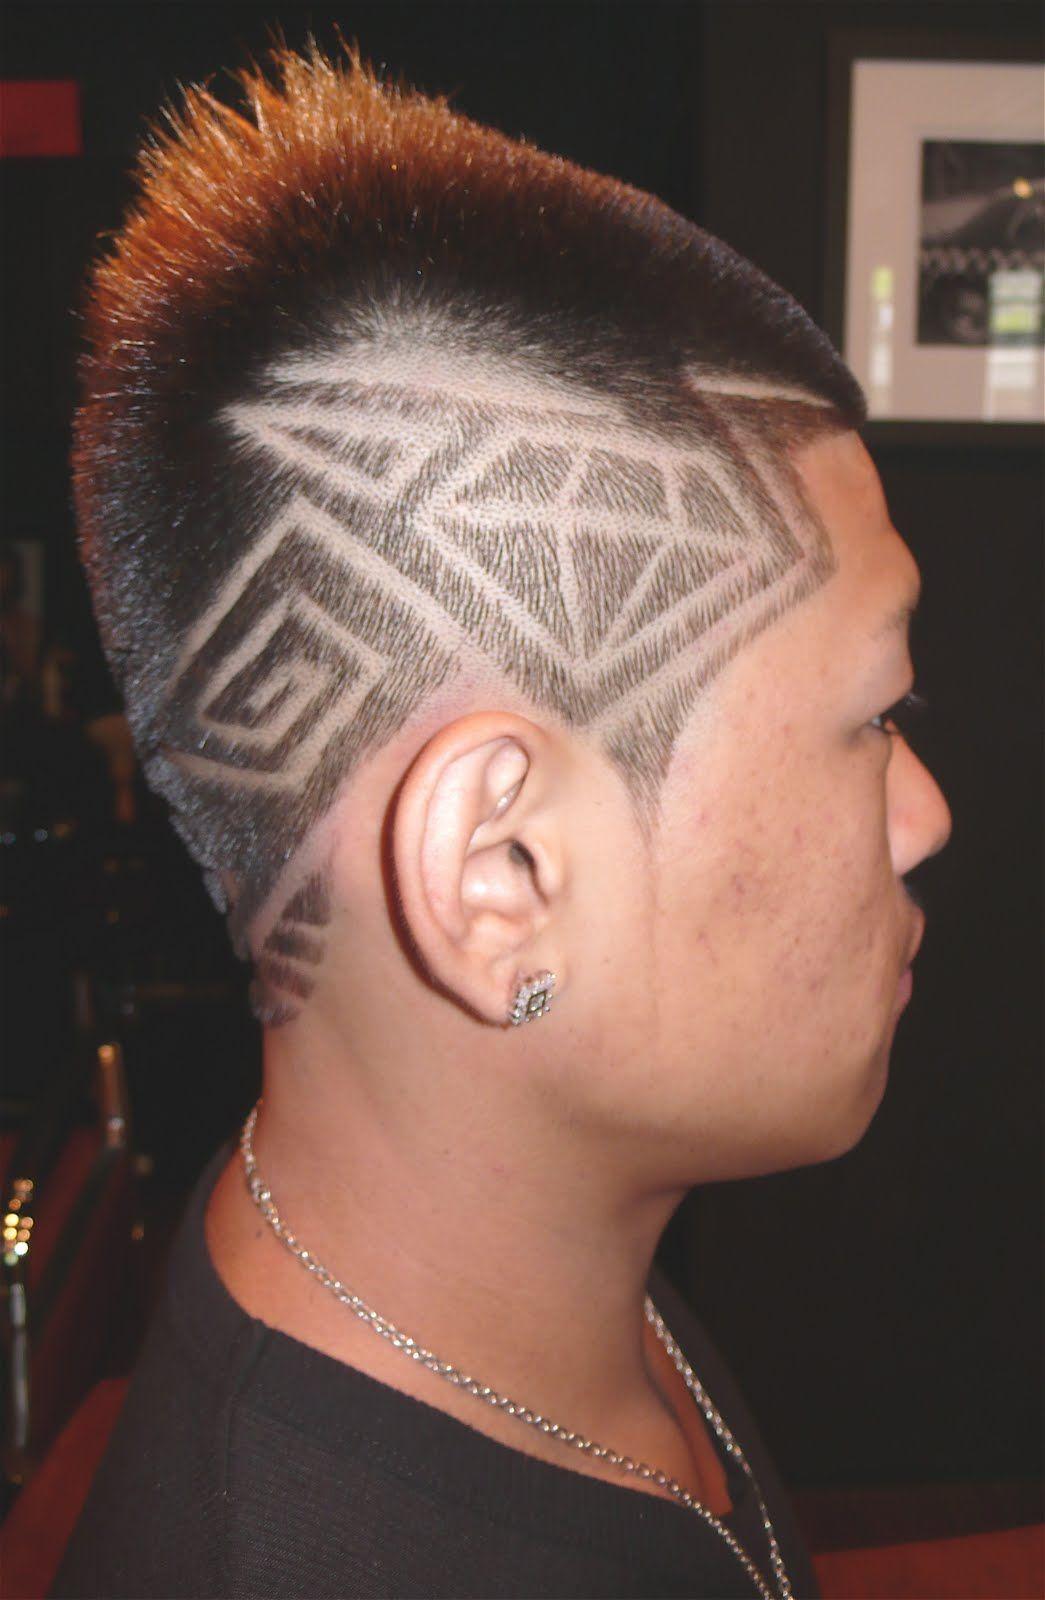 Barber cuts shine bright like a diamond boy cutz pinterest